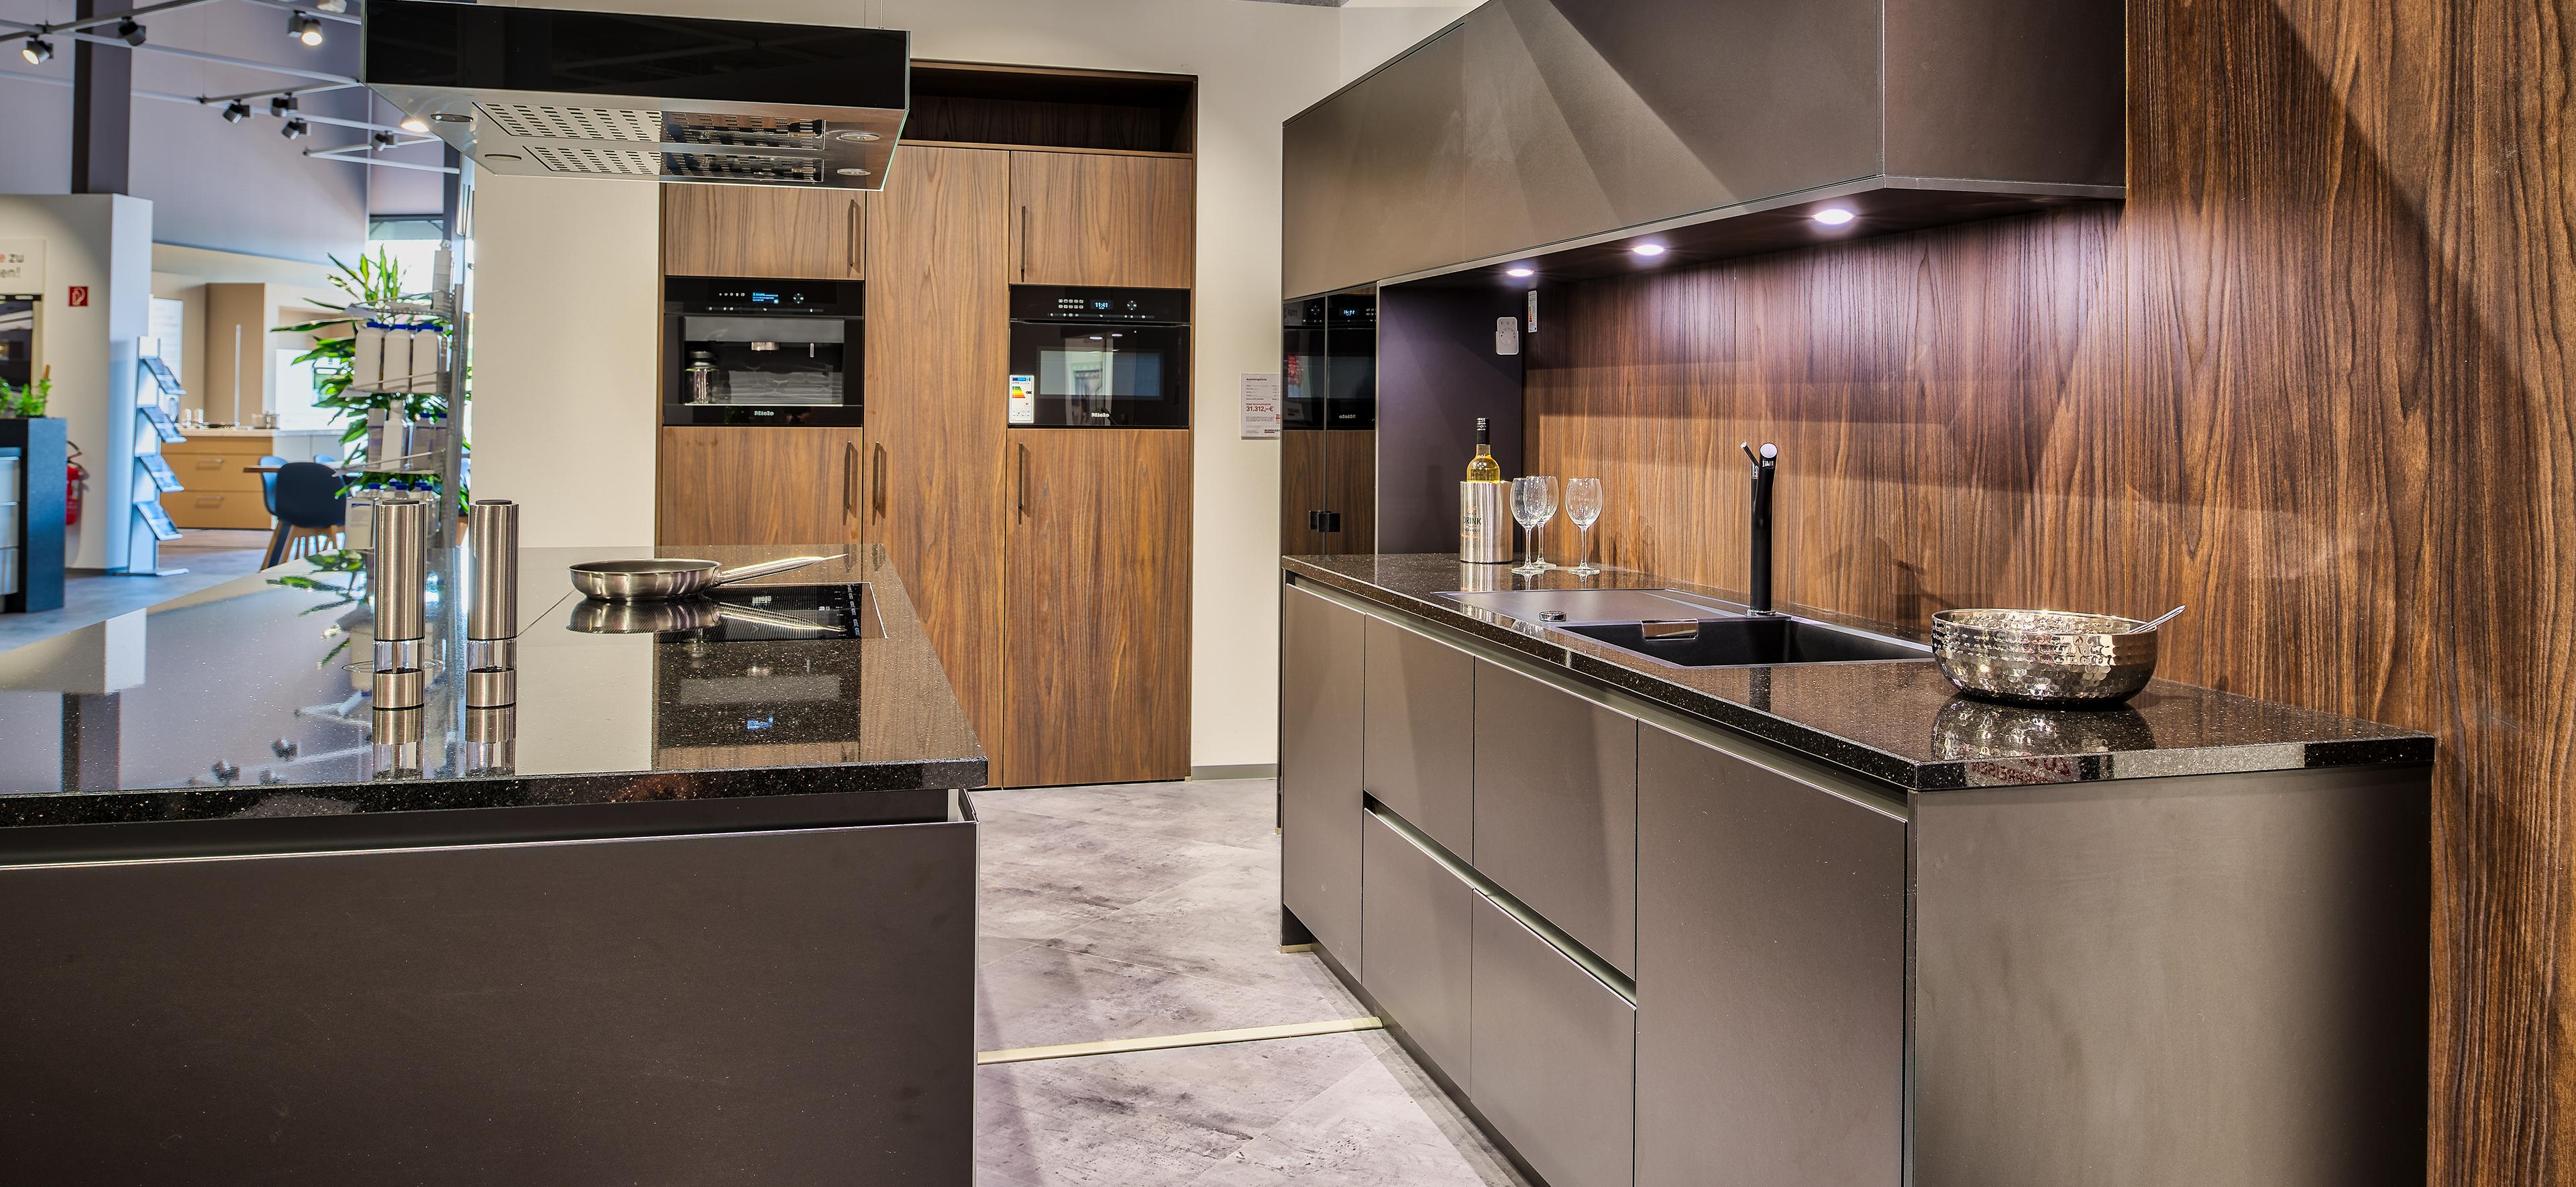 k chenstudio aachen w rselen marquardt k chen. Black Bedroom Furniture Sets. Home Design Ideas